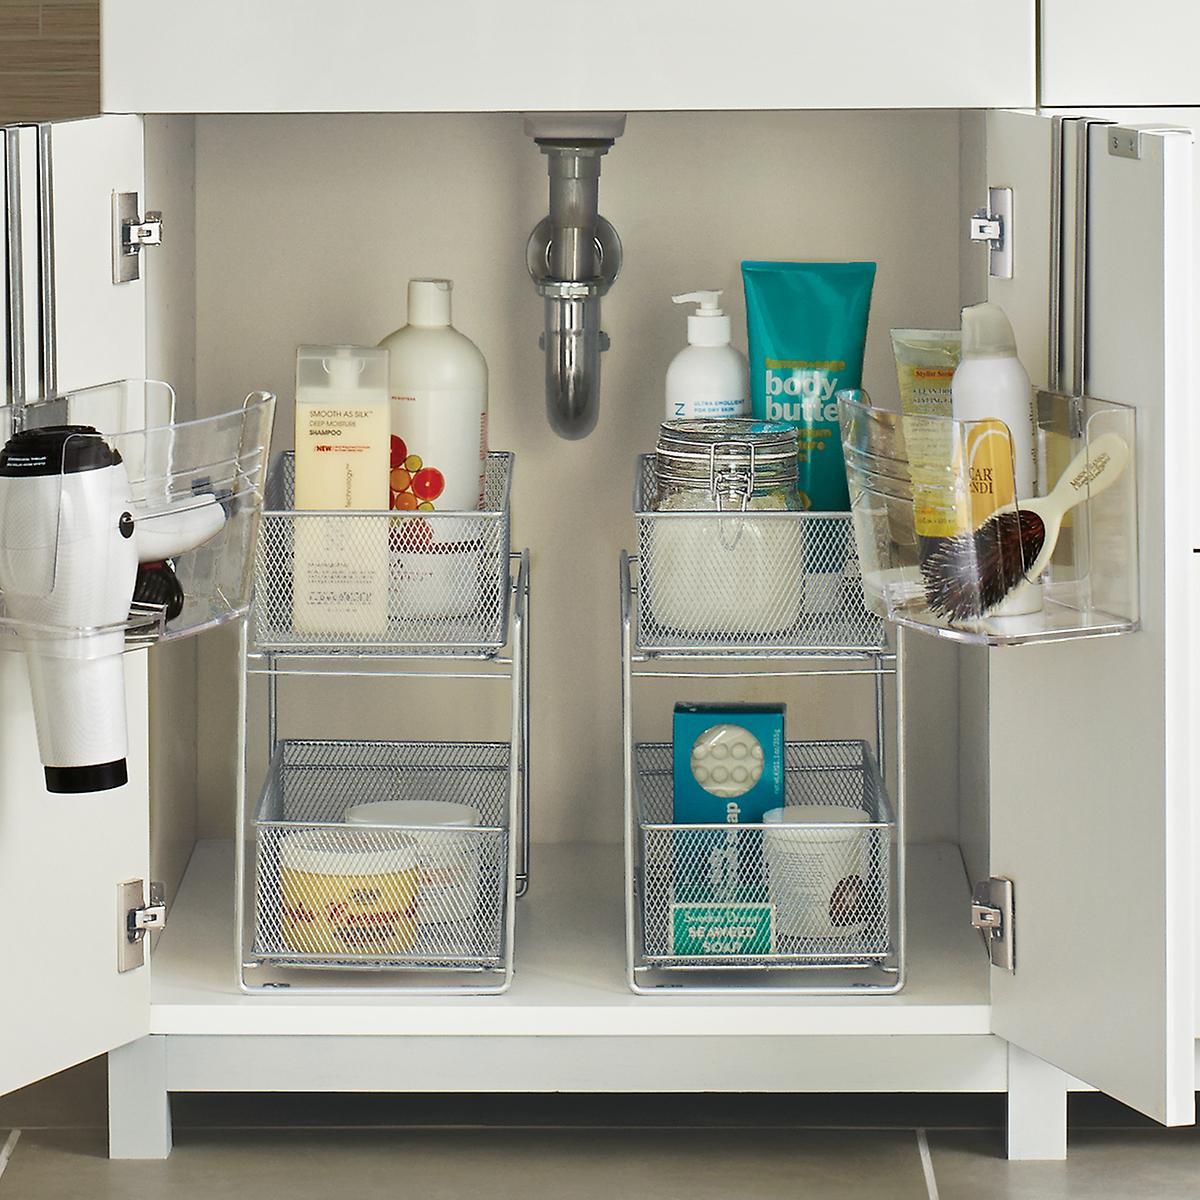 Best ideas about Bathroom Sink Organizer . Save or Pin Silver 2 Drawer Mesh Organizer Now.